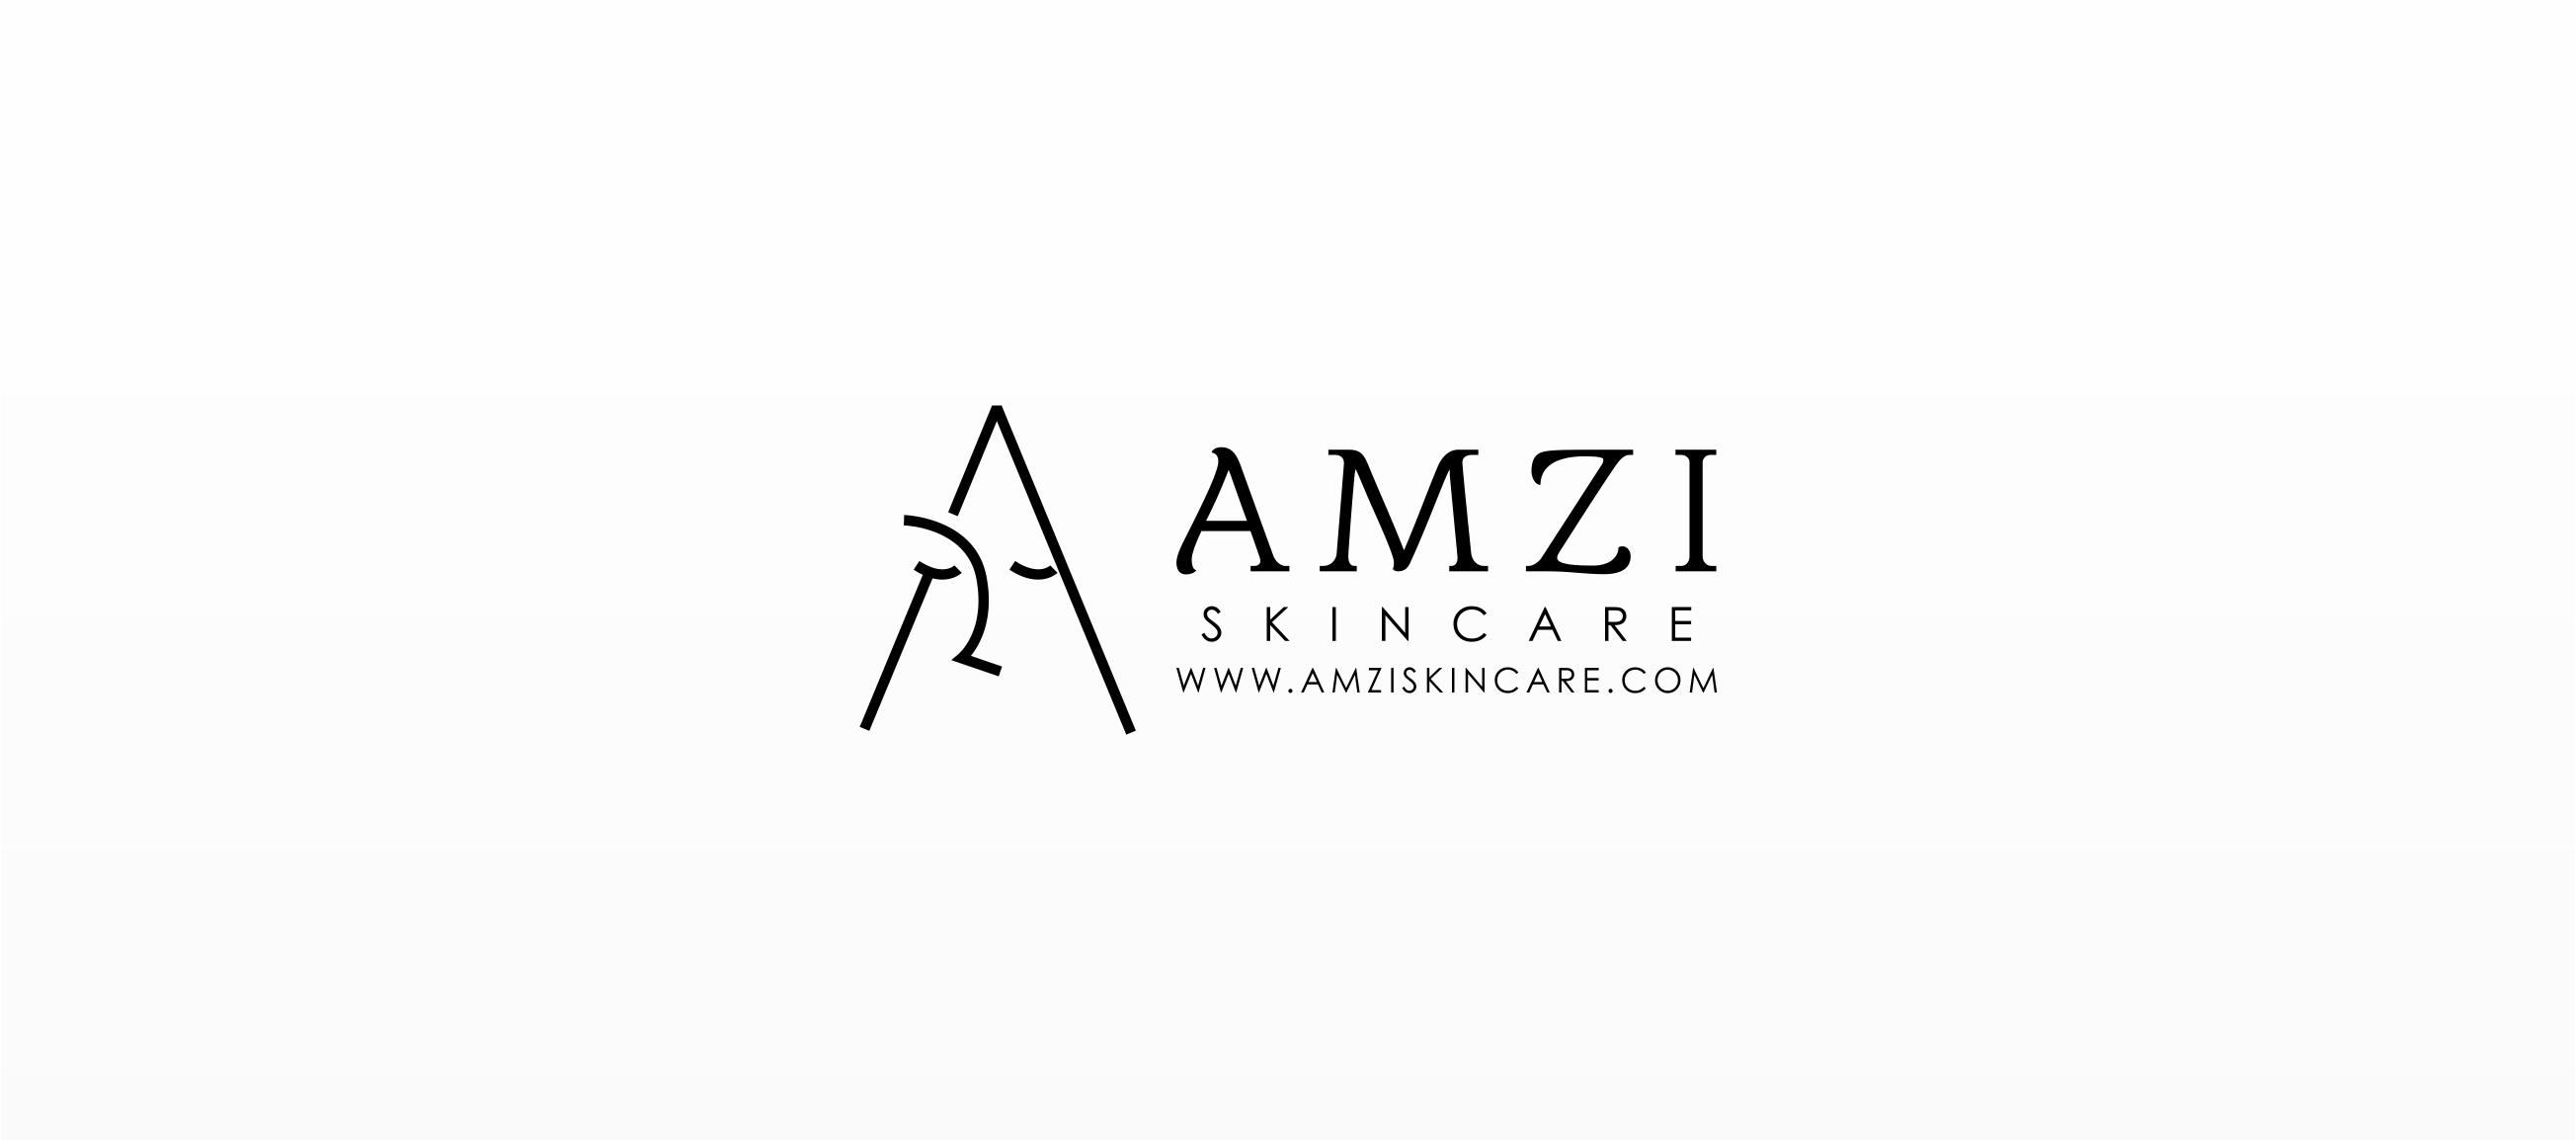 Amzi Skincare